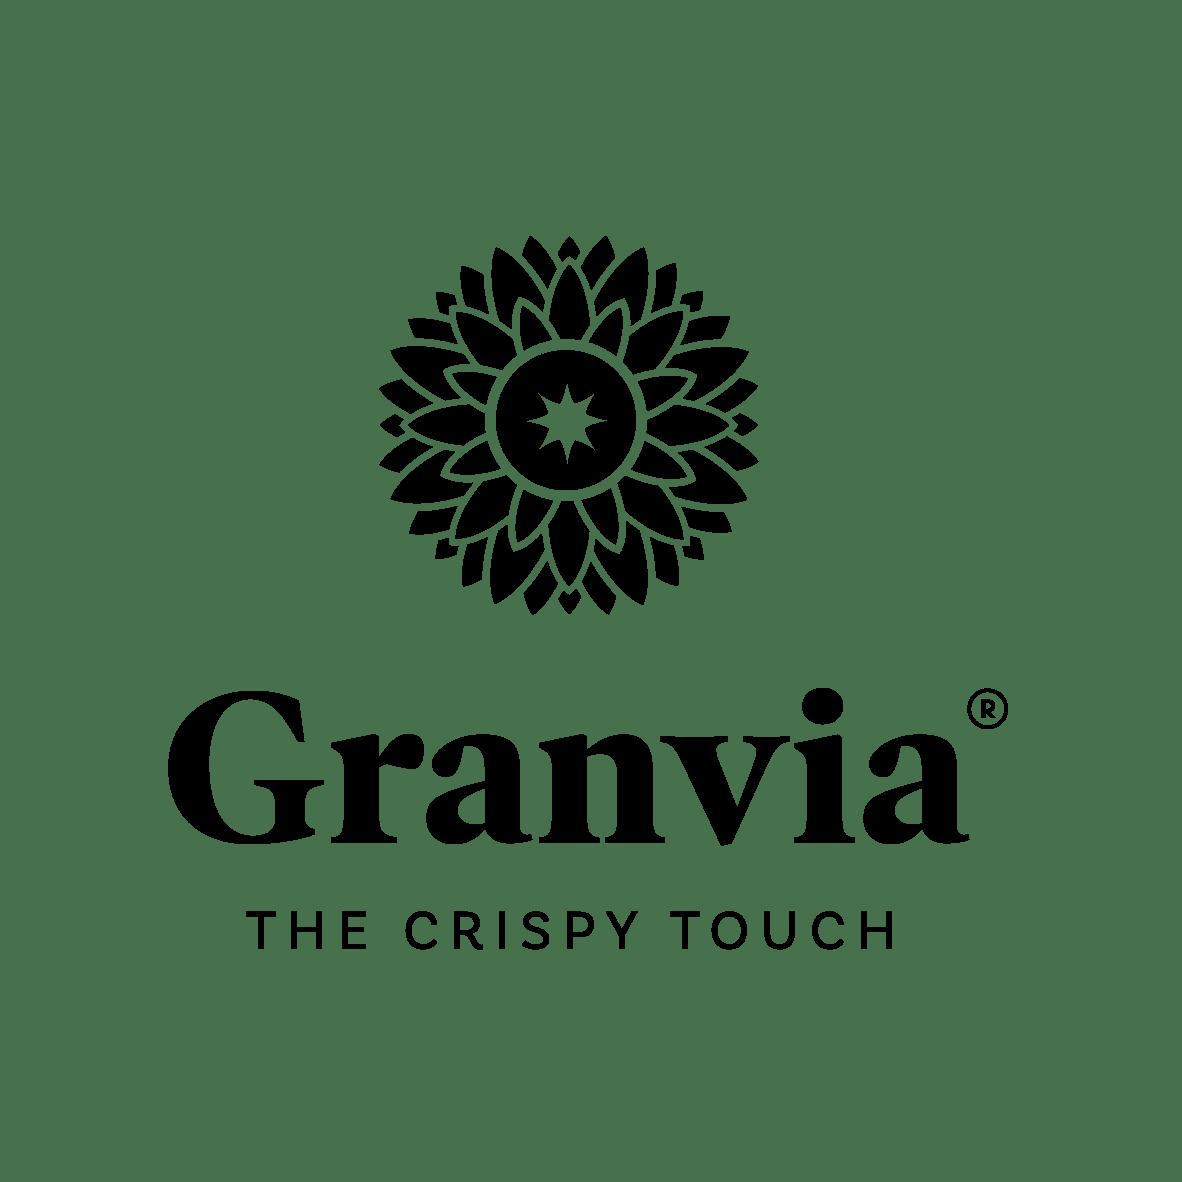 Granvia logo black